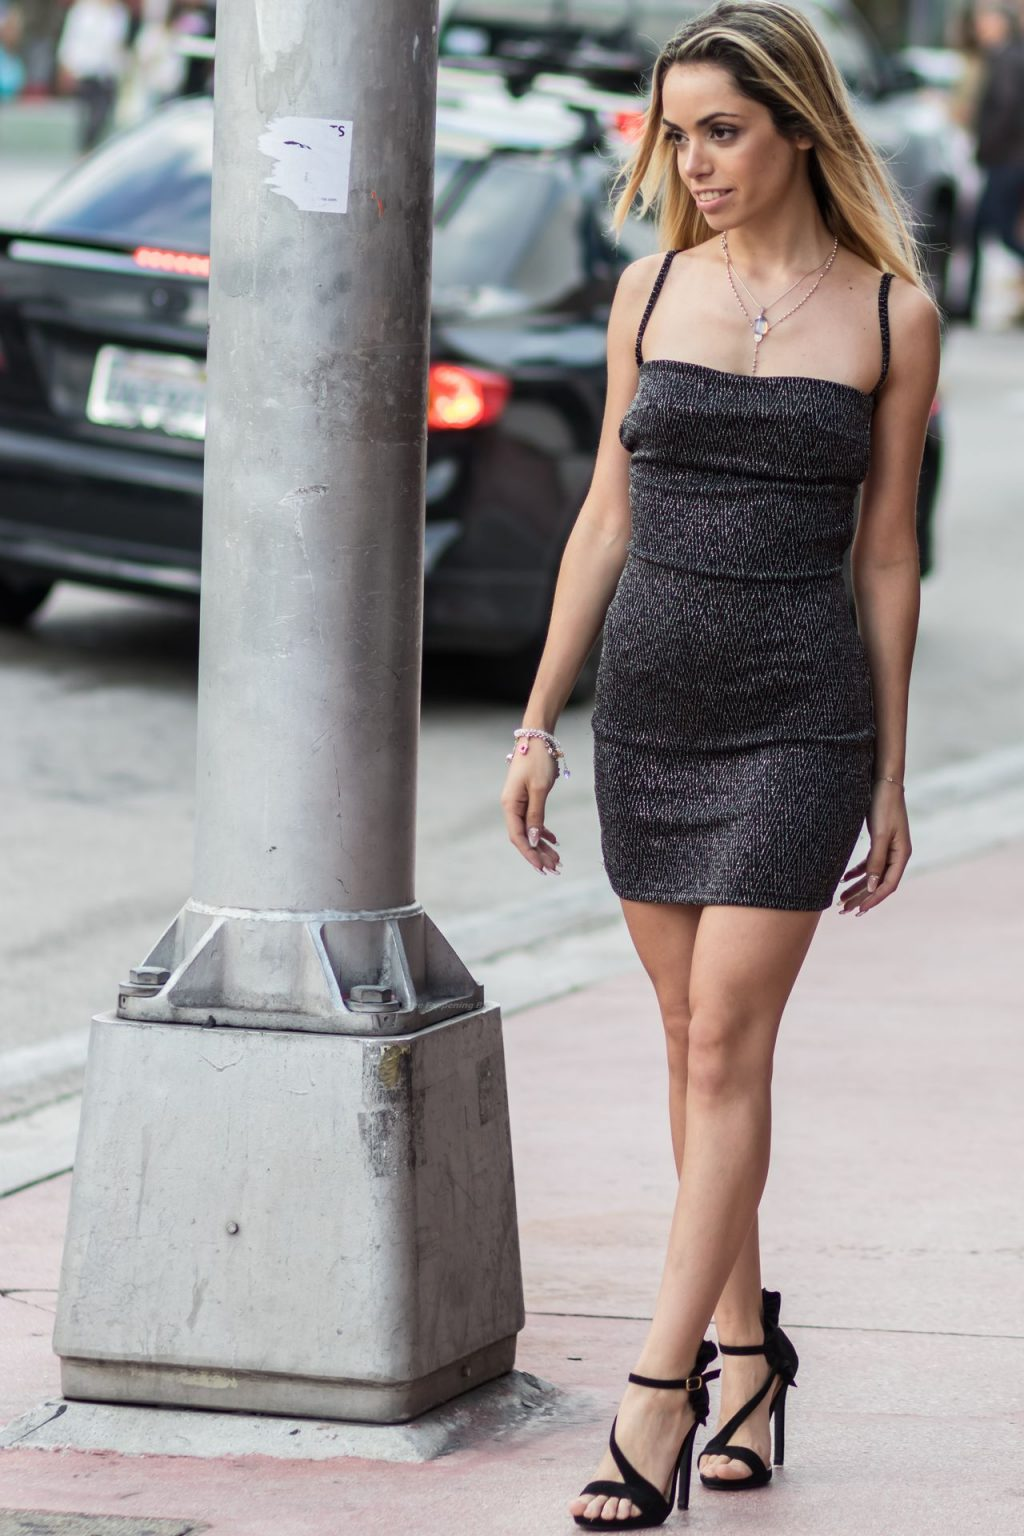 Claudia Romani & Cloe Greco Are Seen Walking South Beach (19 Photos)